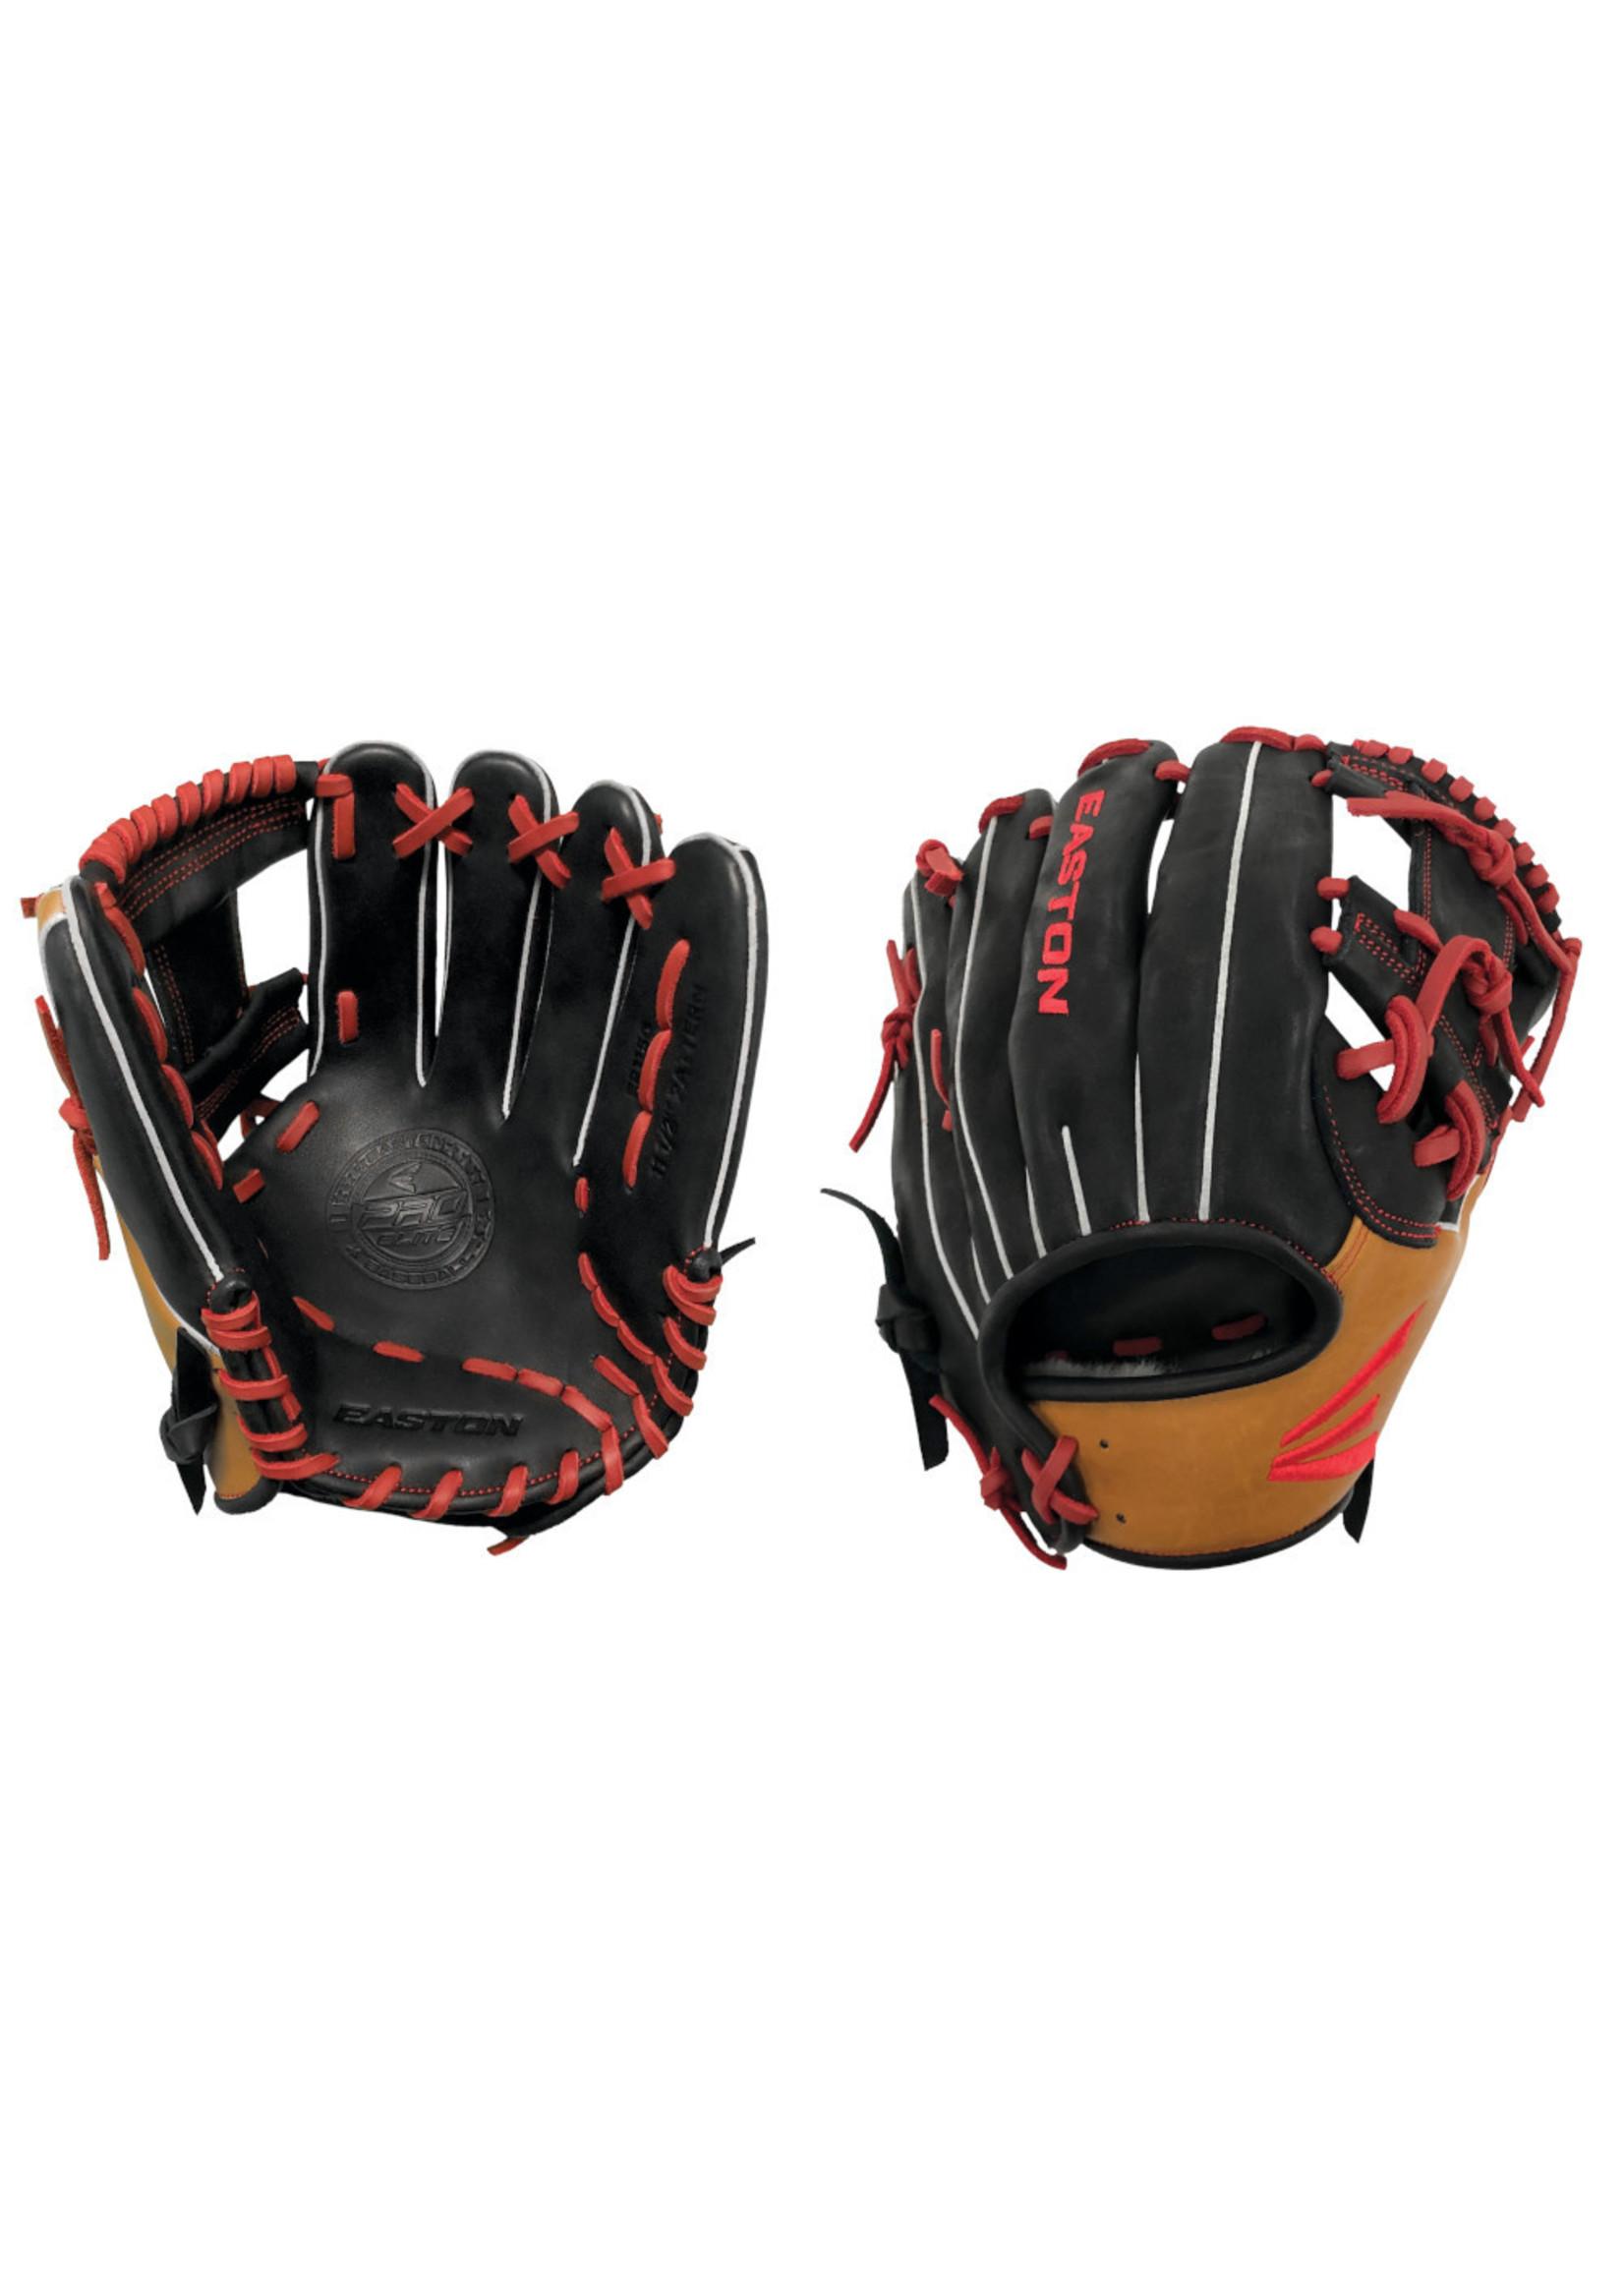 Easton Baseball (Canada) EASTON PRO ELITE 11.5'' GLOVE